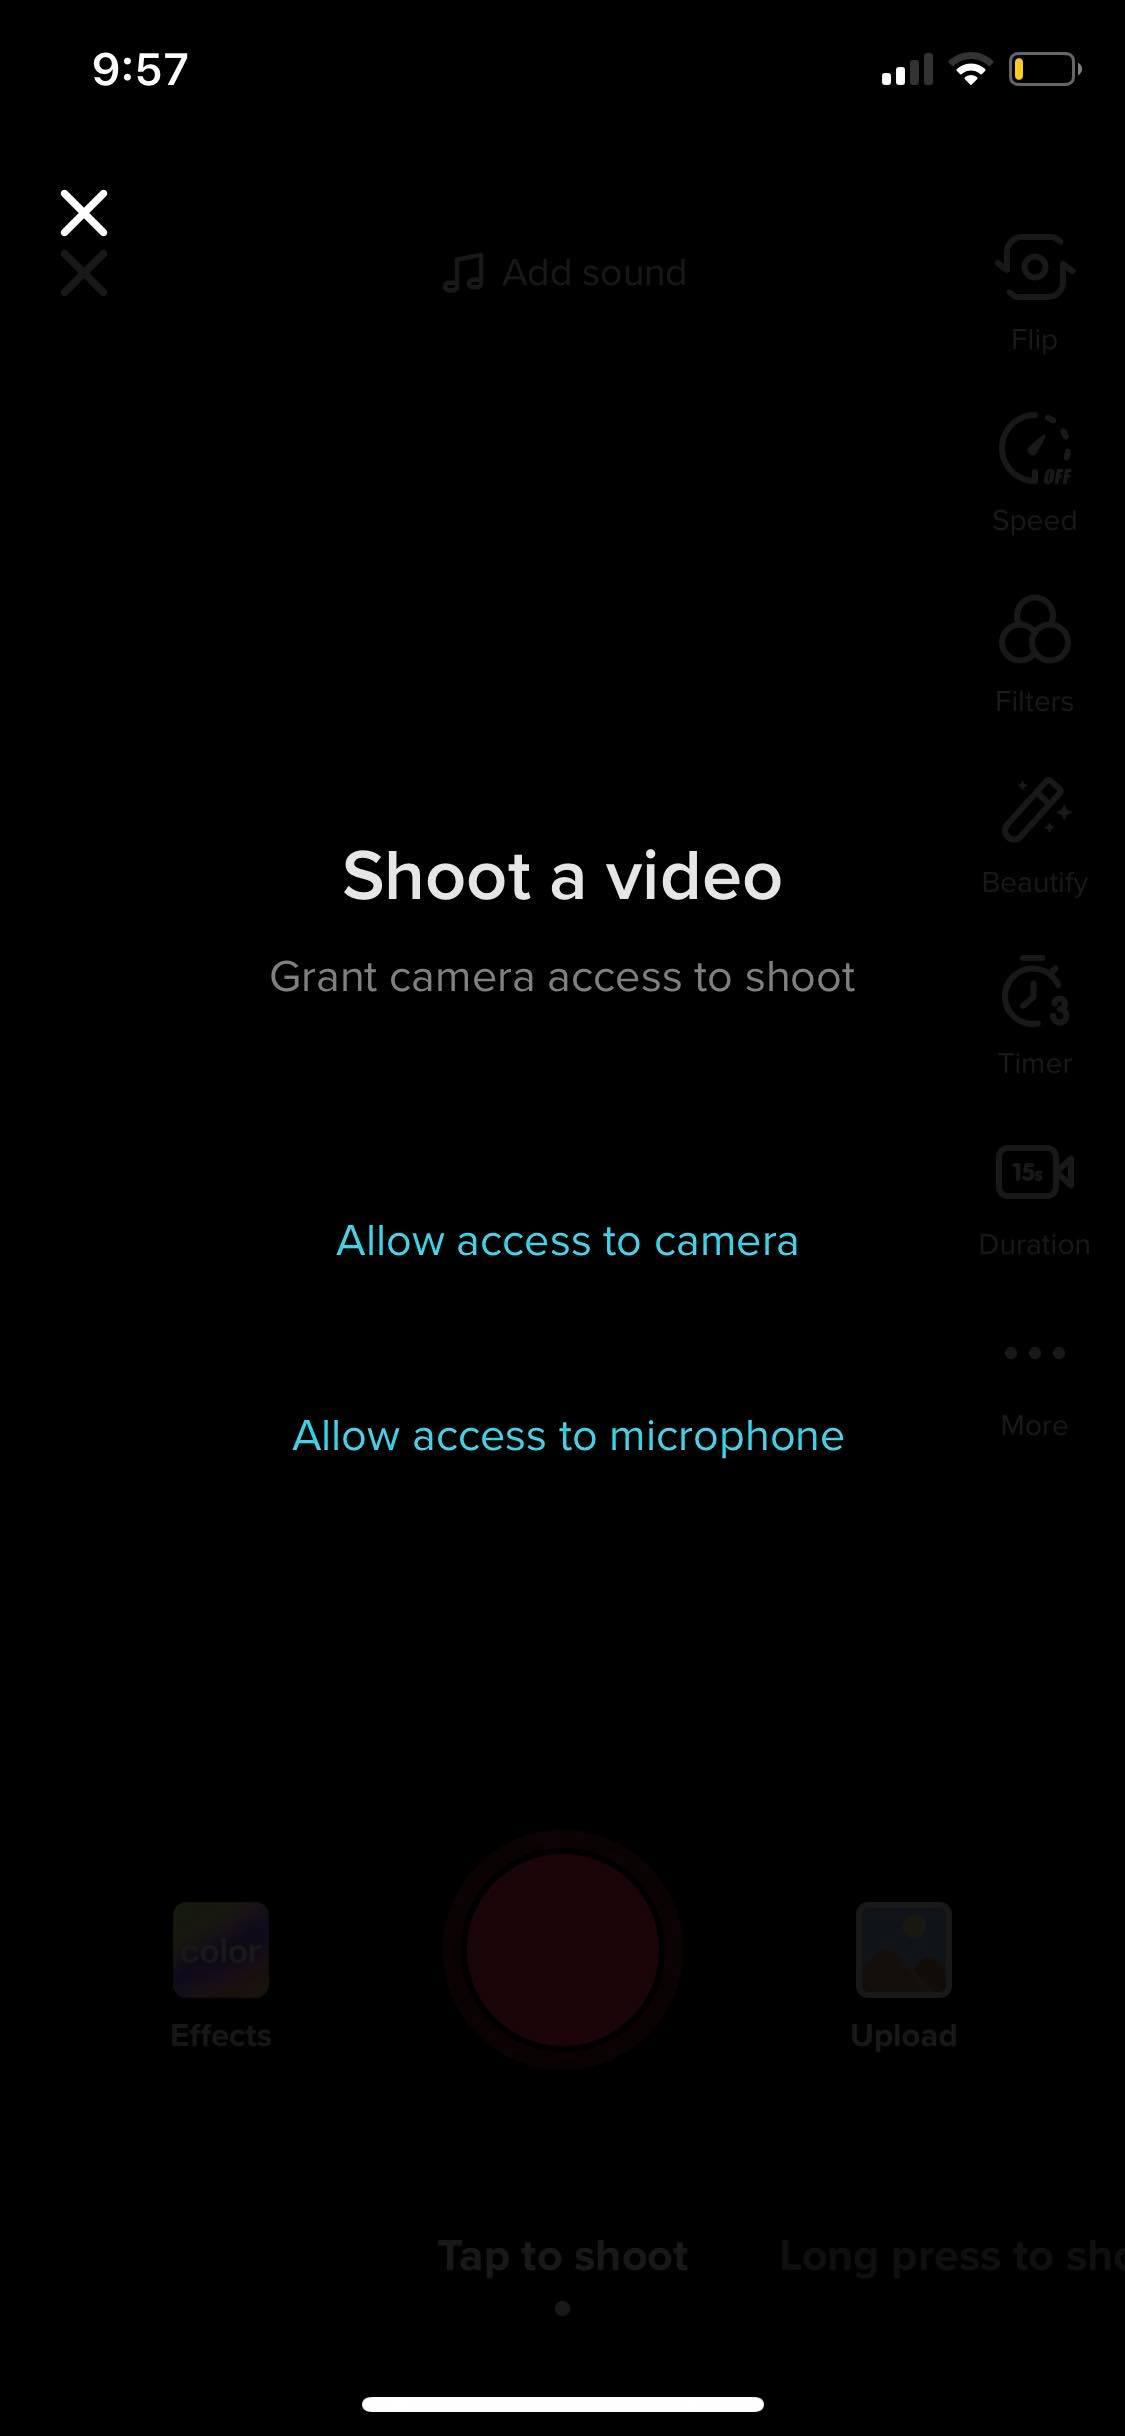 Shoot a Video on iOS by Tiktok